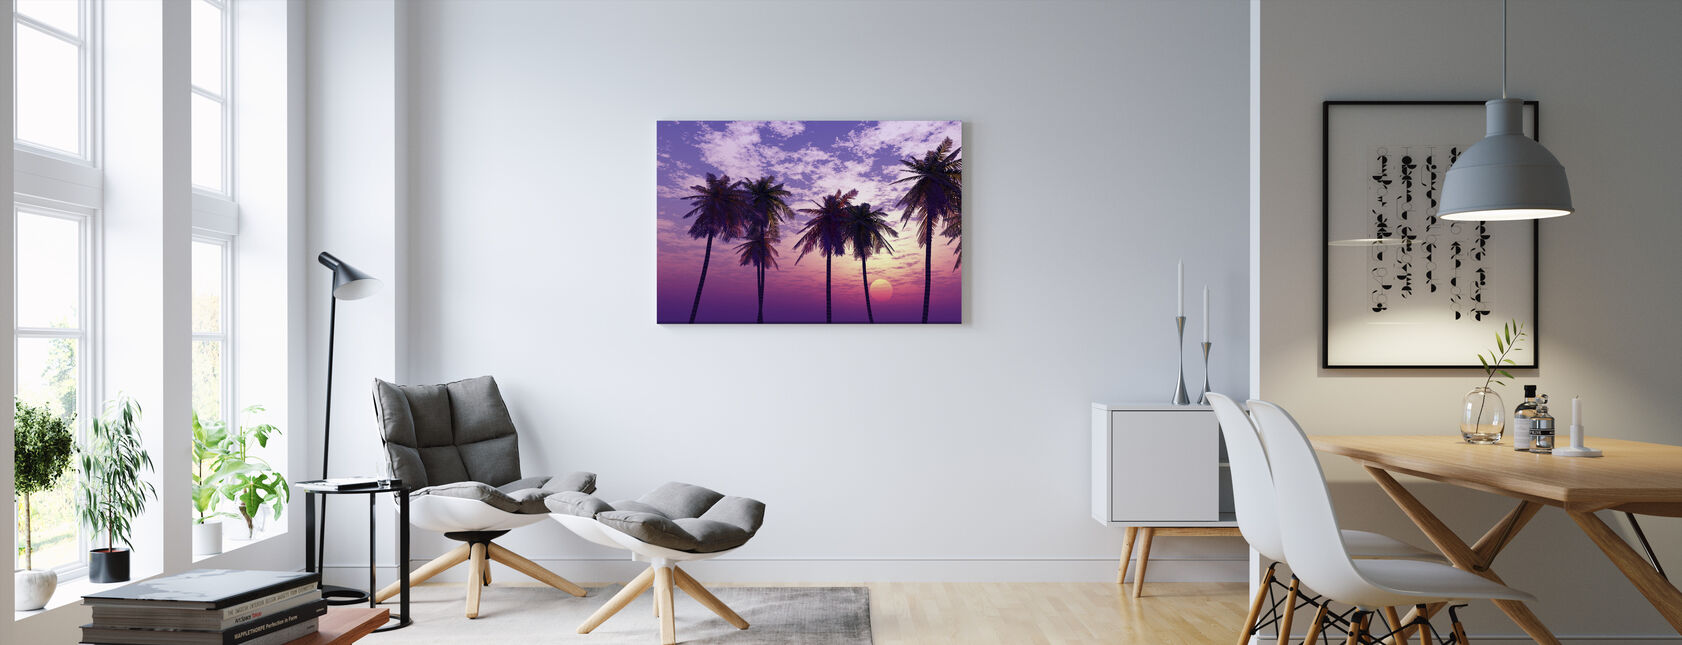 Kaunis auringonlasku - Canvastaulu - Olohuone